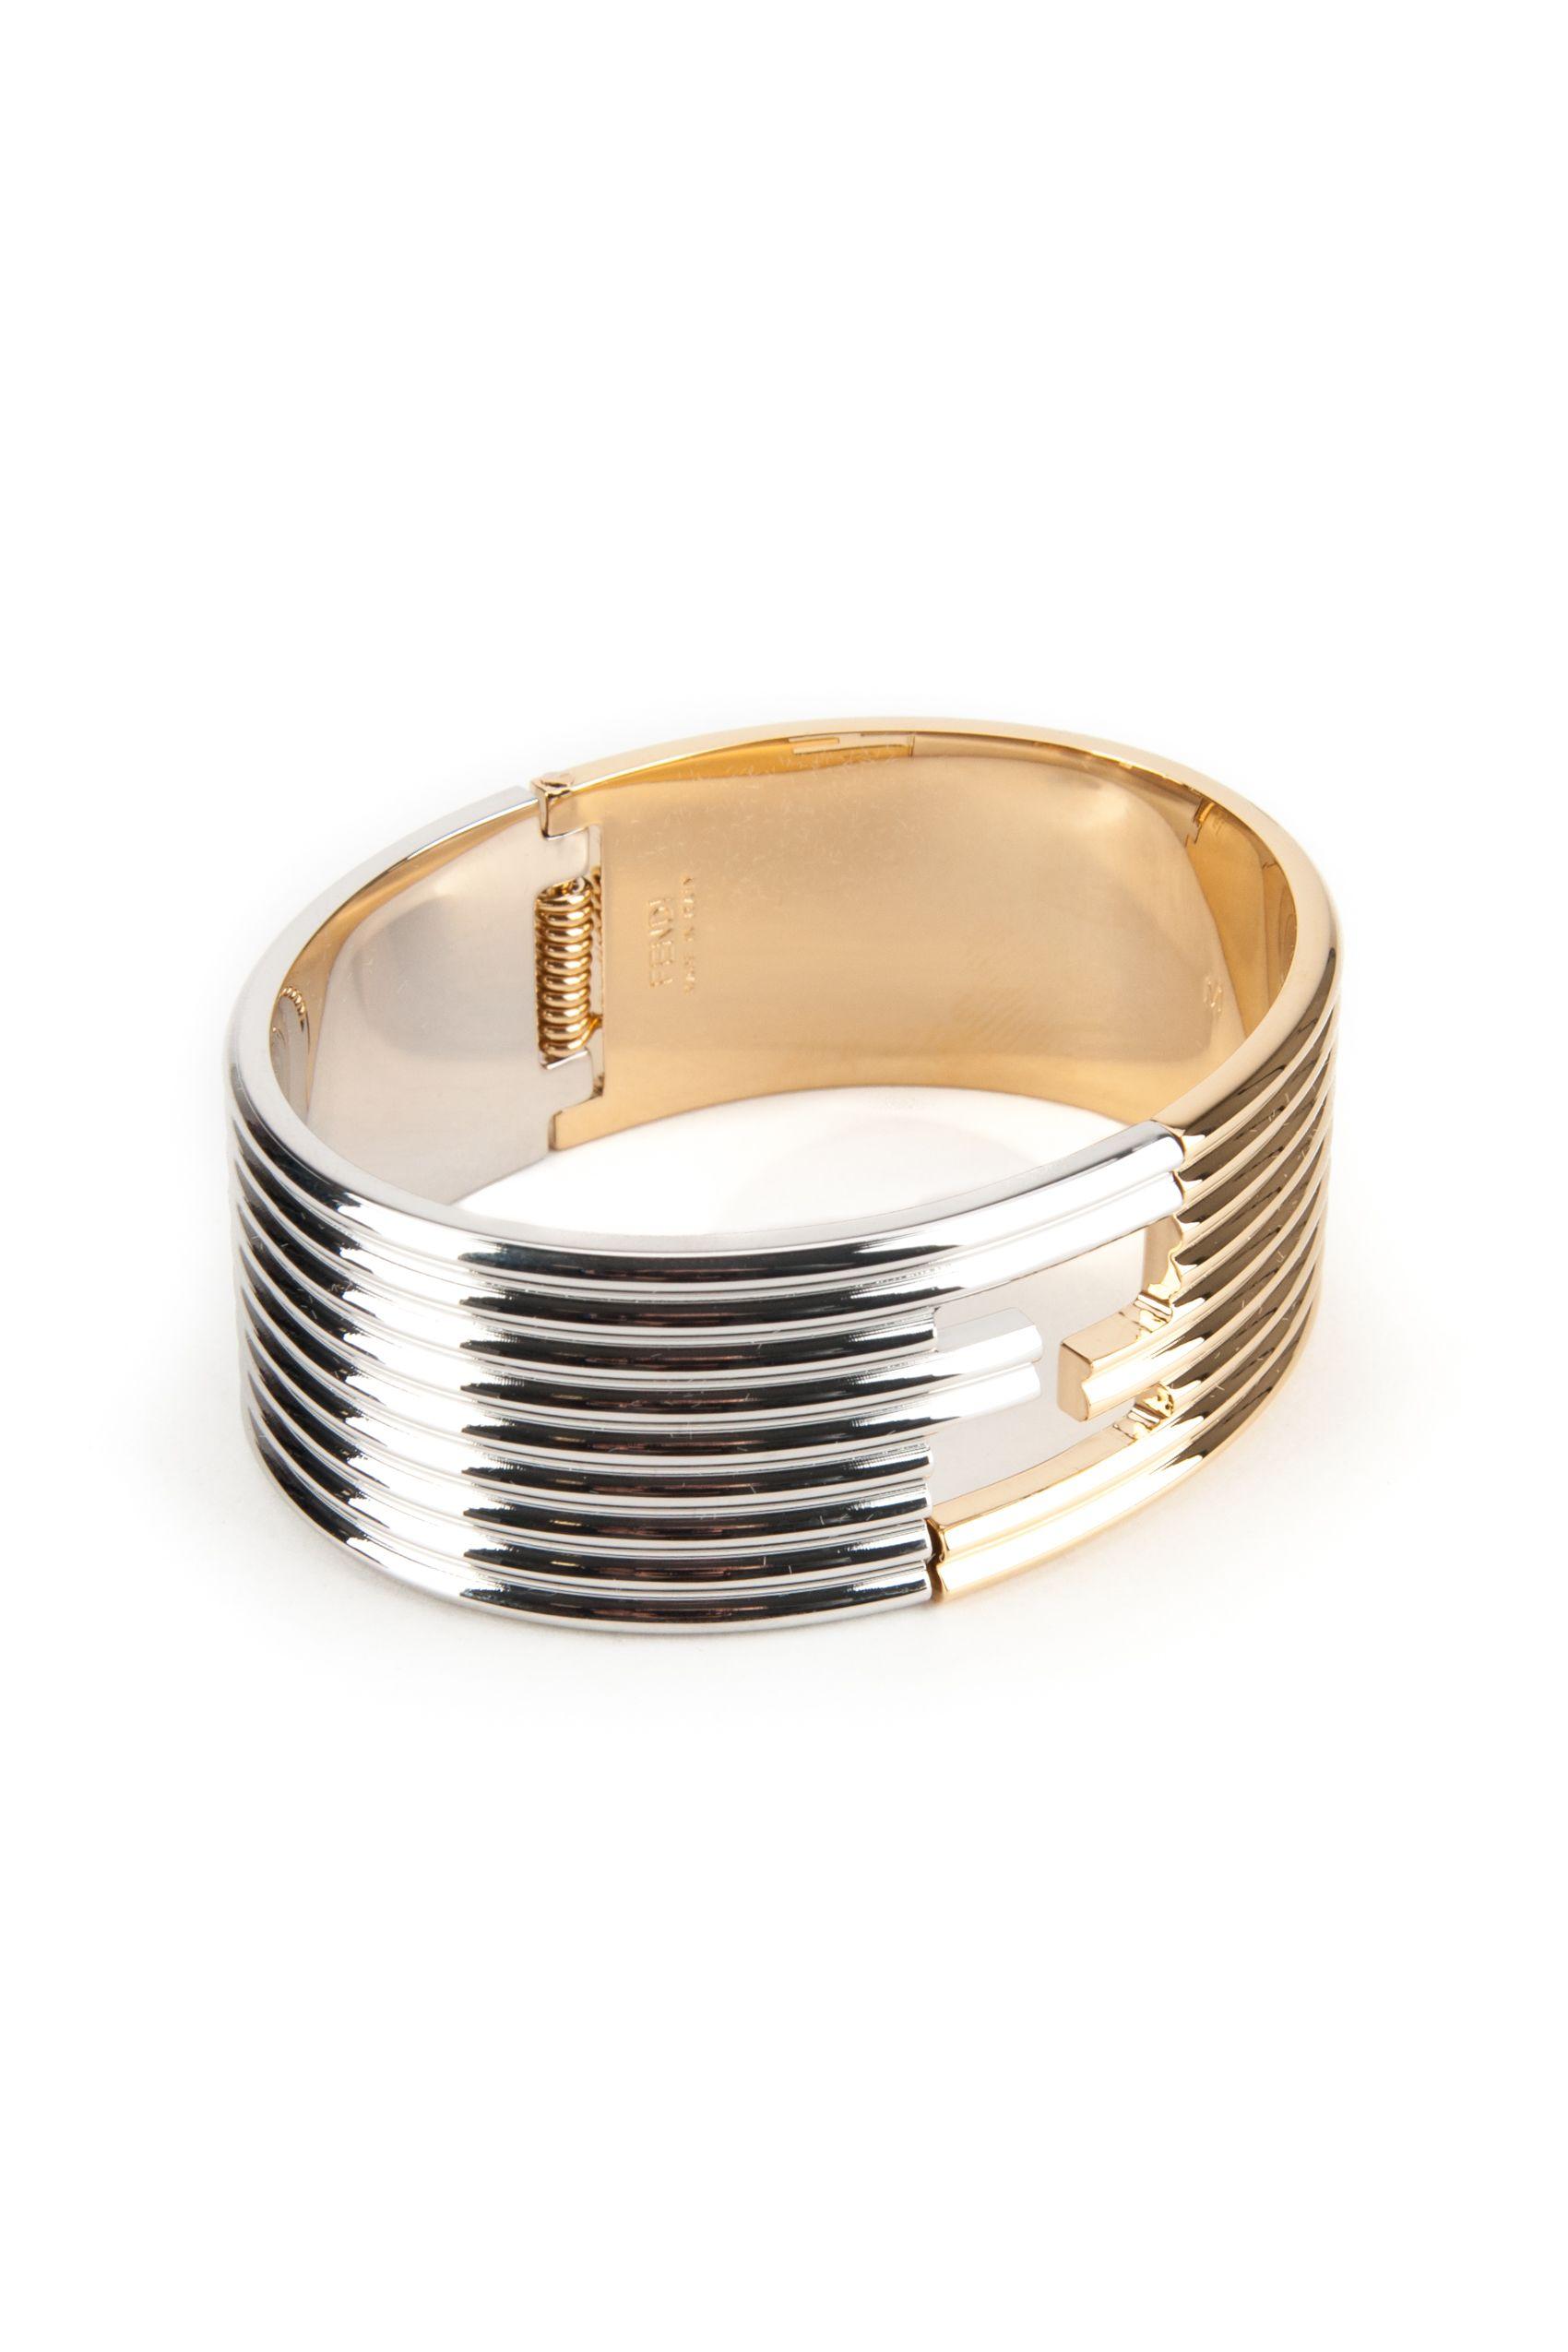 FENDI Solid Metal Bracelet in Oro Soft+Palladio|Metallico